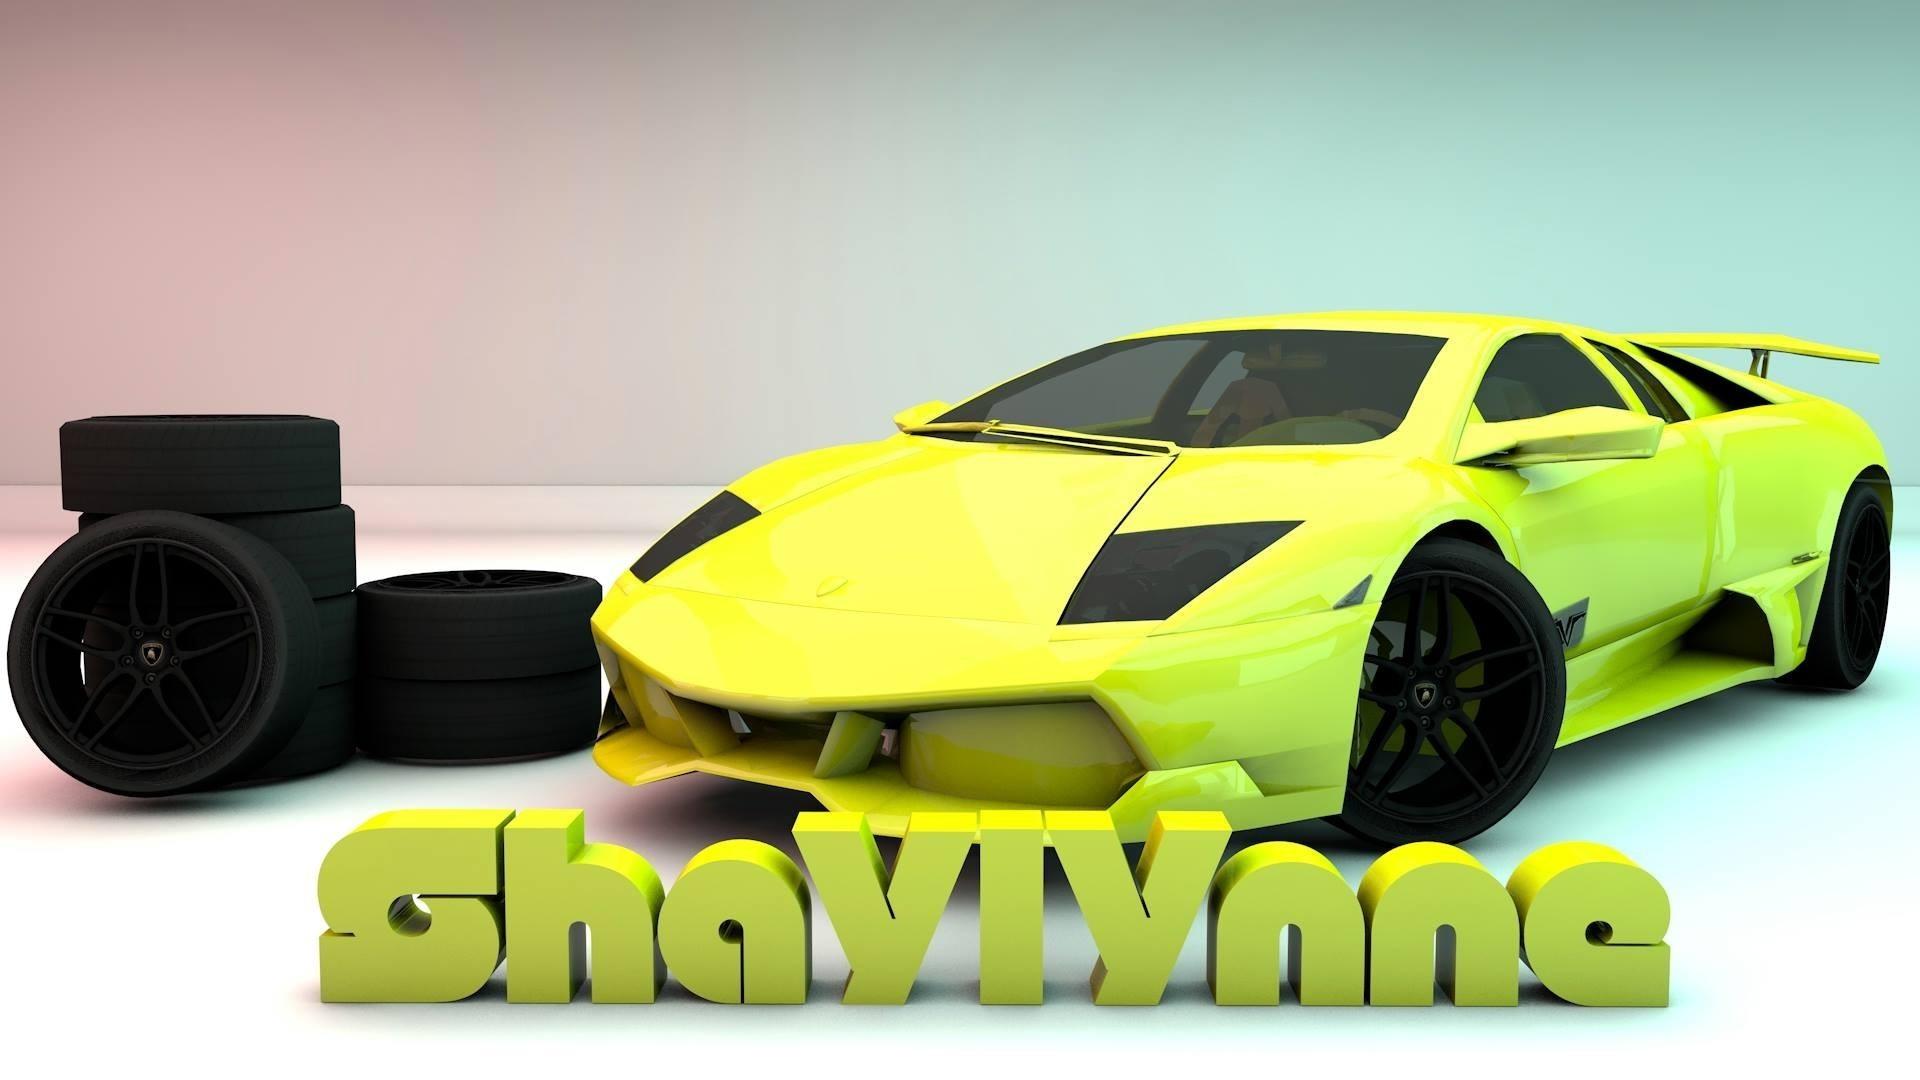 Wallpaper : digital art, yellow, Lamborghini Aventador, technology ...